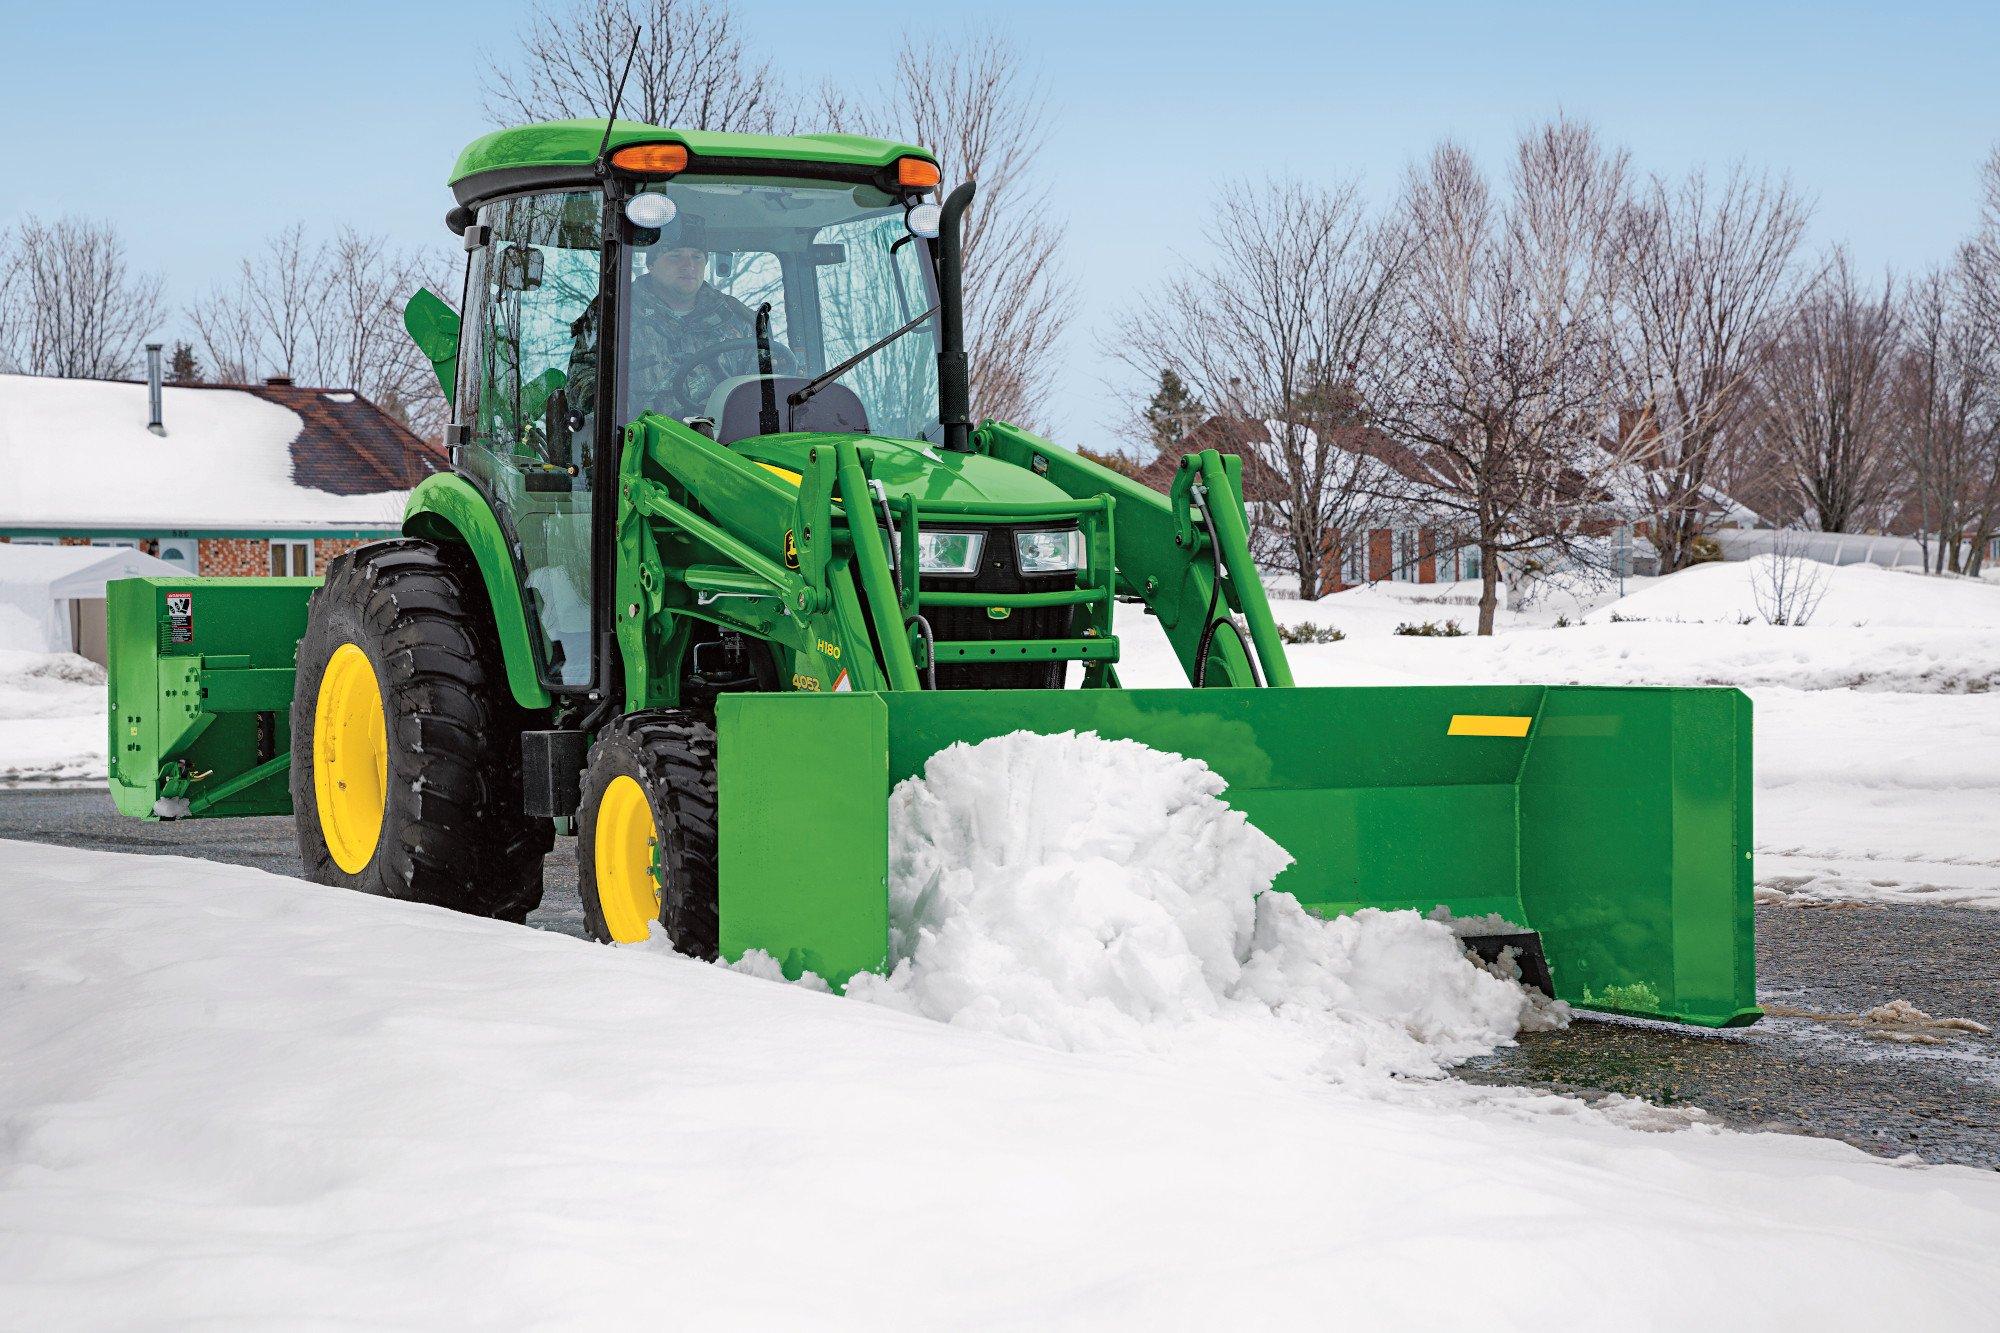 John Deere Compact Tractor with Frontier Snow pusher